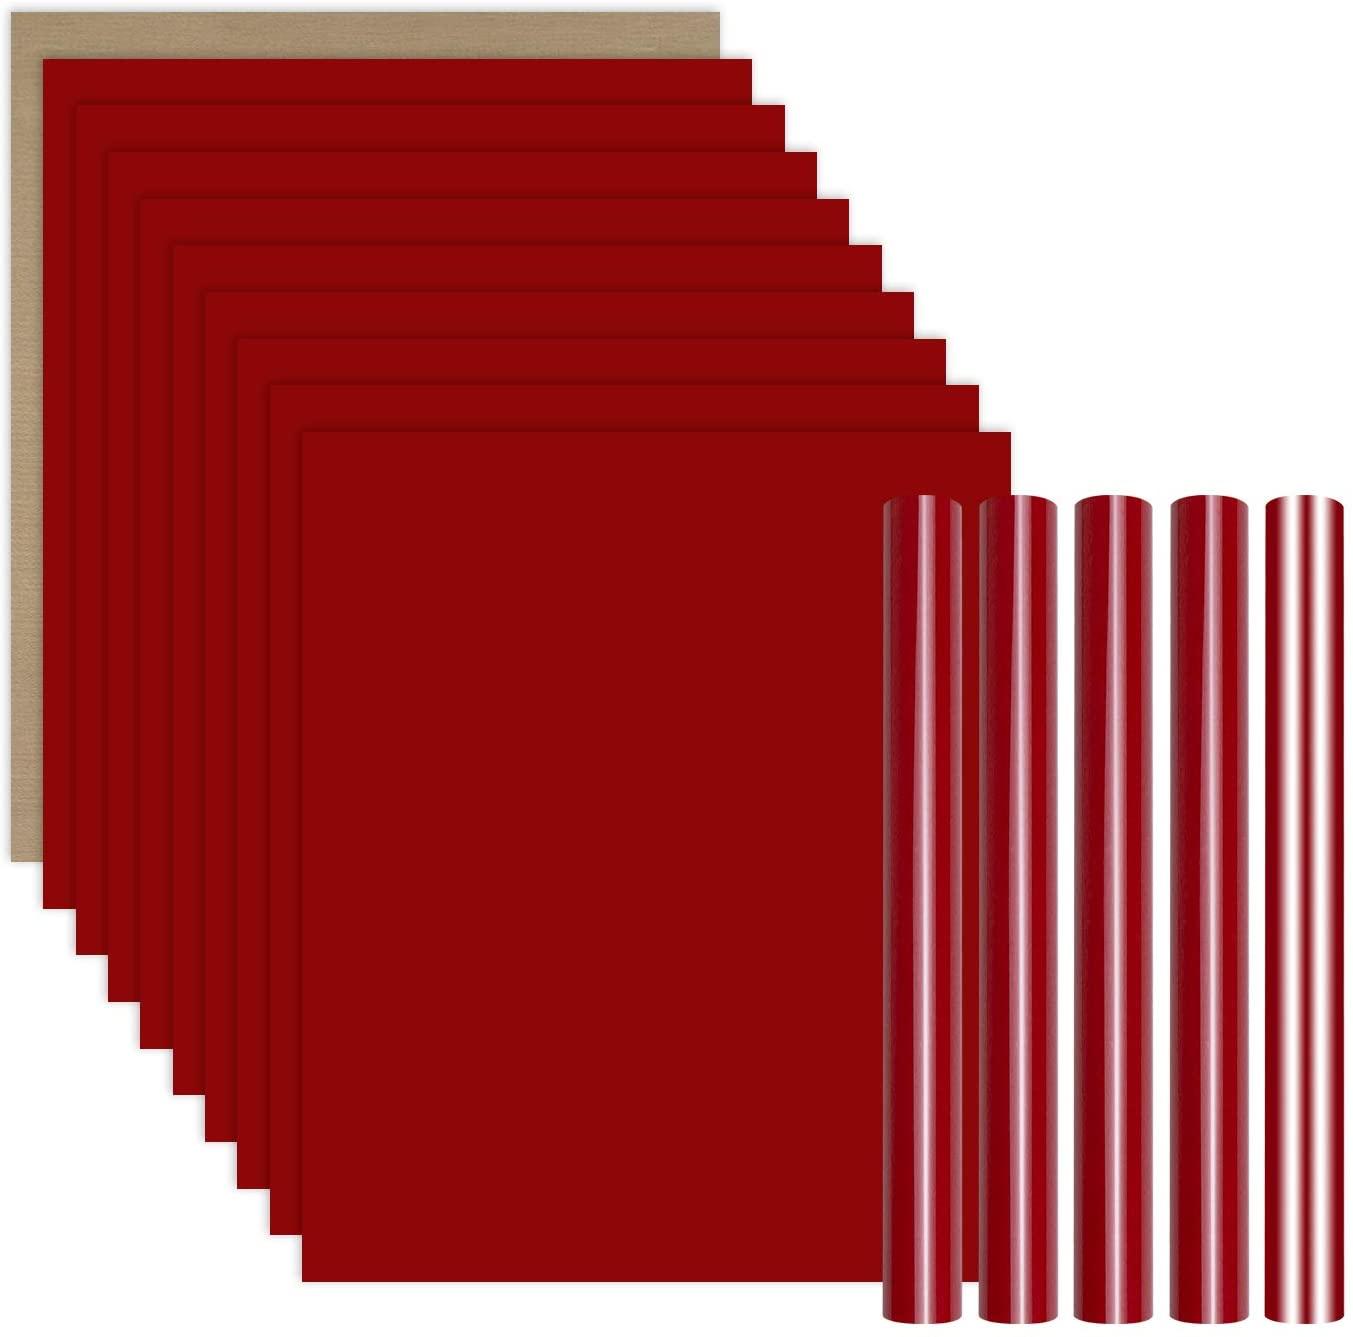 YRYM HT Red Heat Transfer Vinyl Bundle : 15 Pack 12 x 10 Sheets - Red Iron on Vinyl for DIY Iron on Fabrics T-Shirts Heat Press Machine